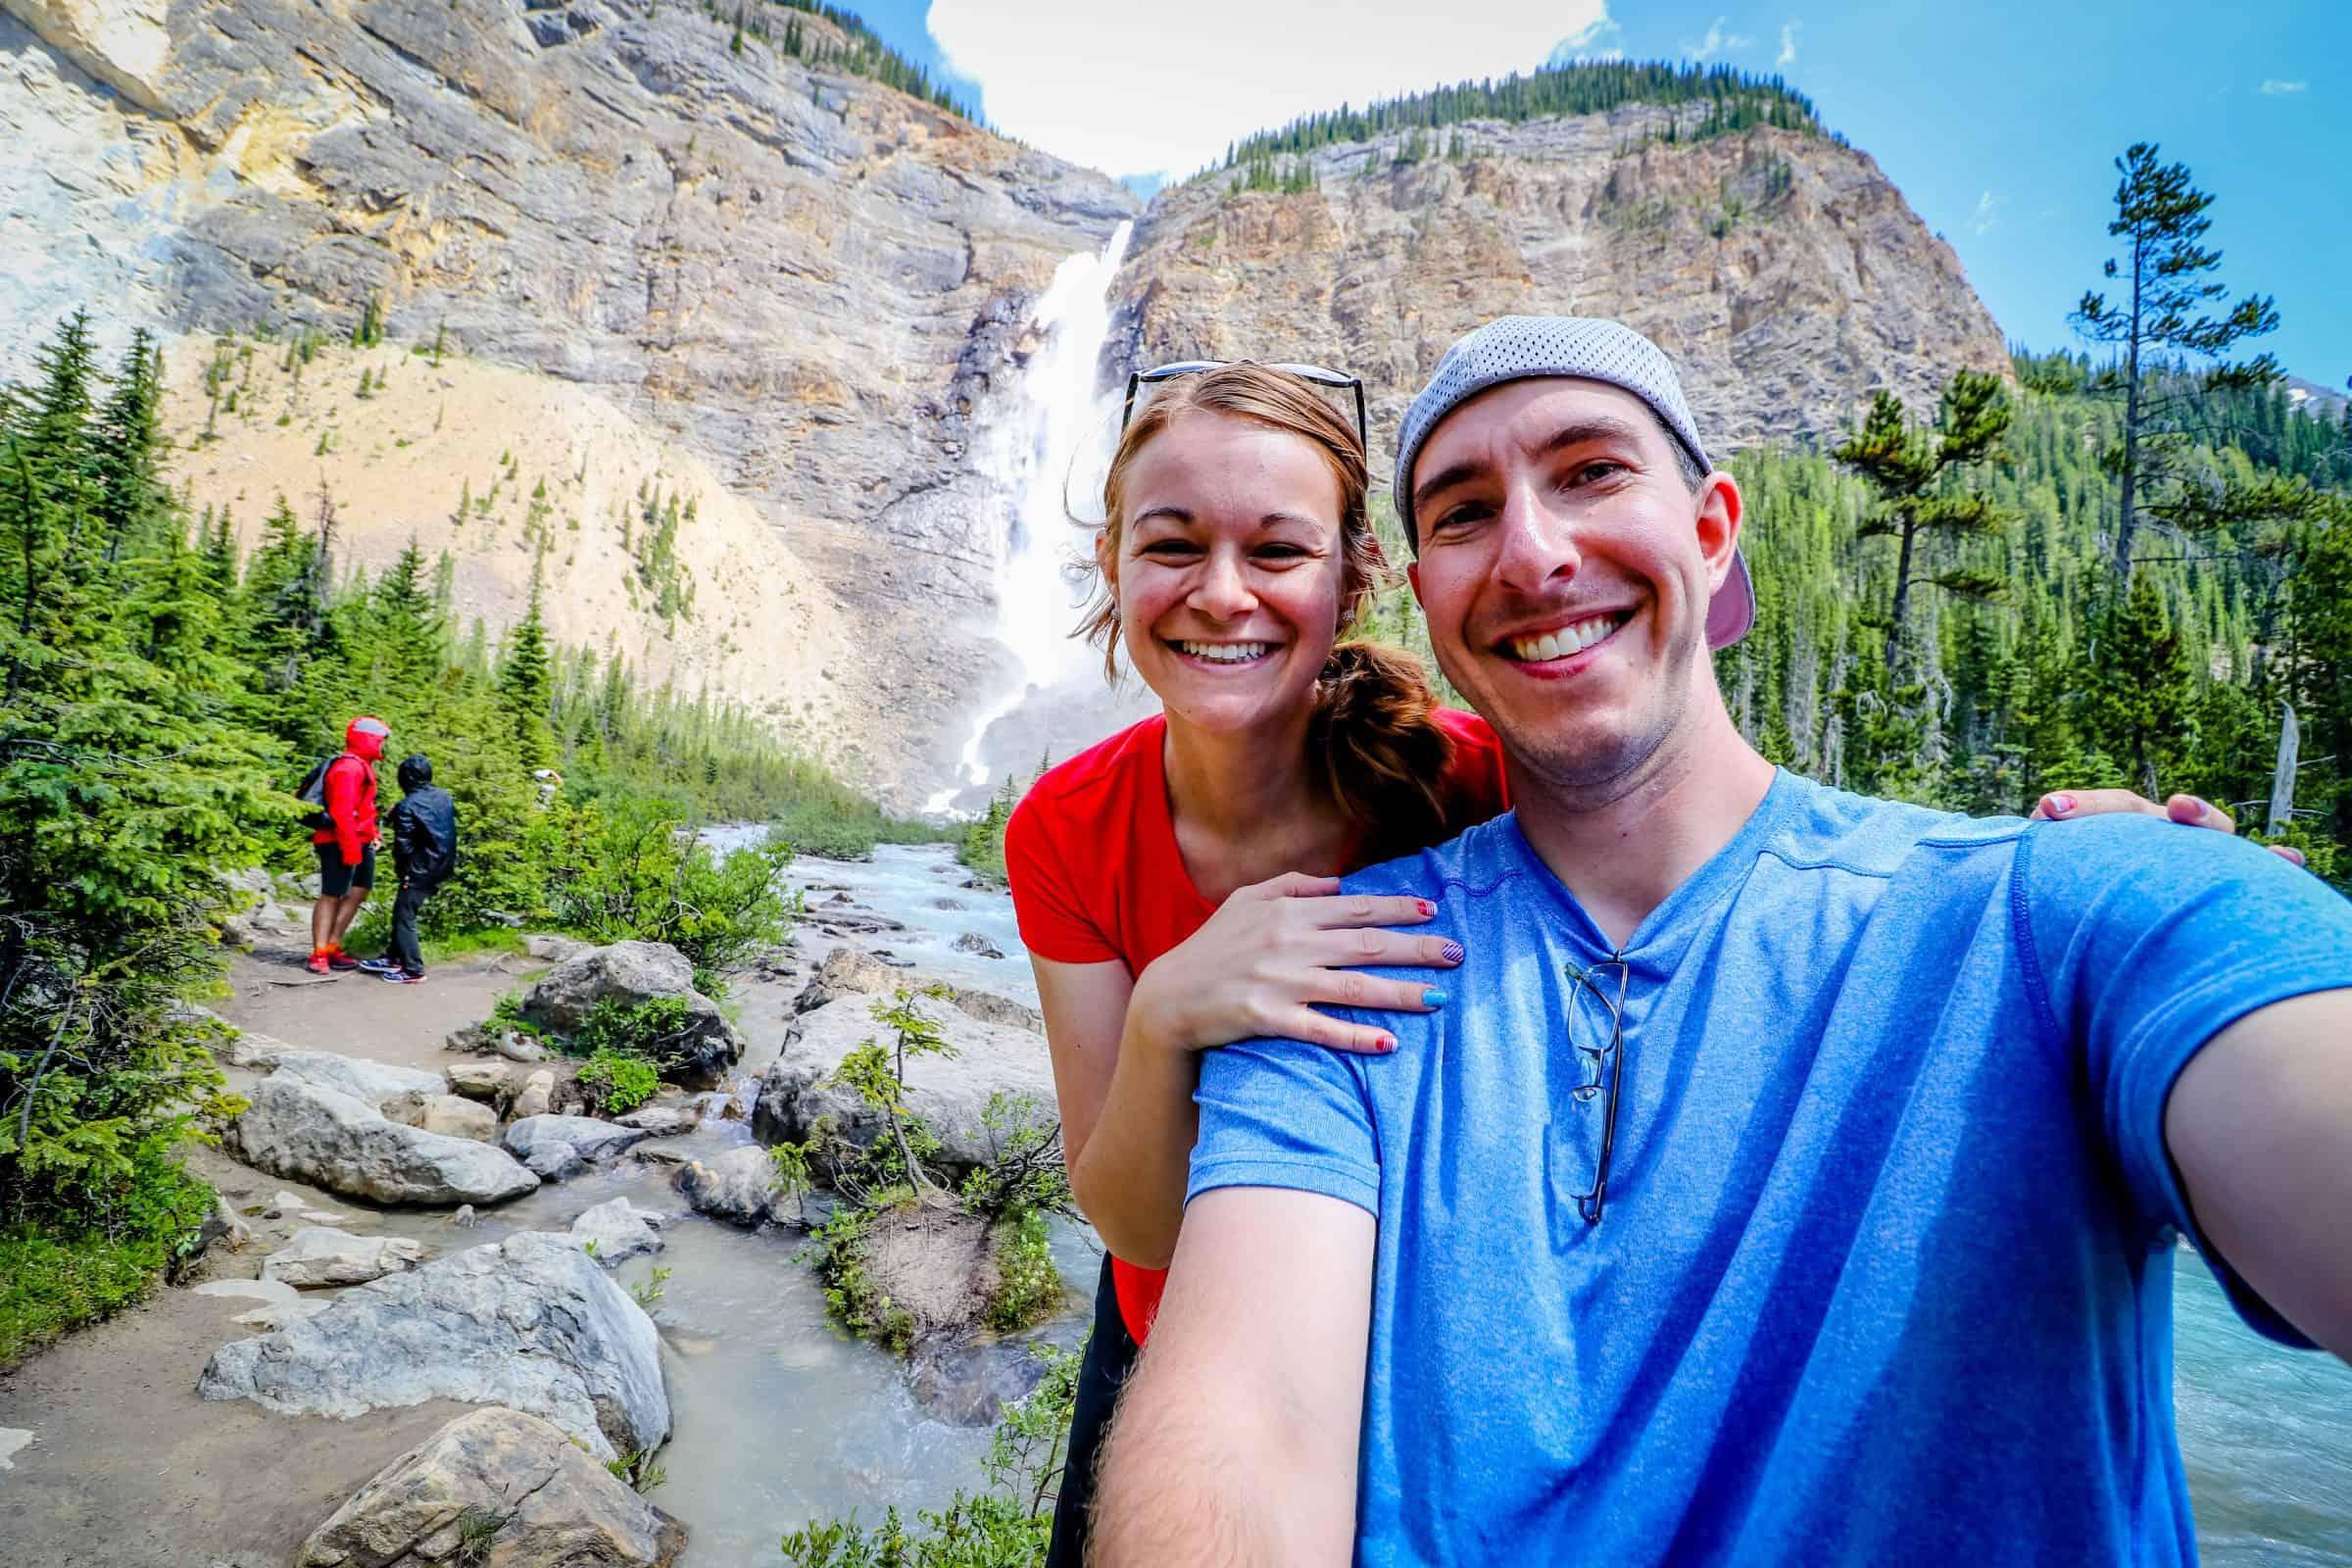 Takakkaw-Falls-Selfie-Yoho-National-Park-Canada-HH-1757